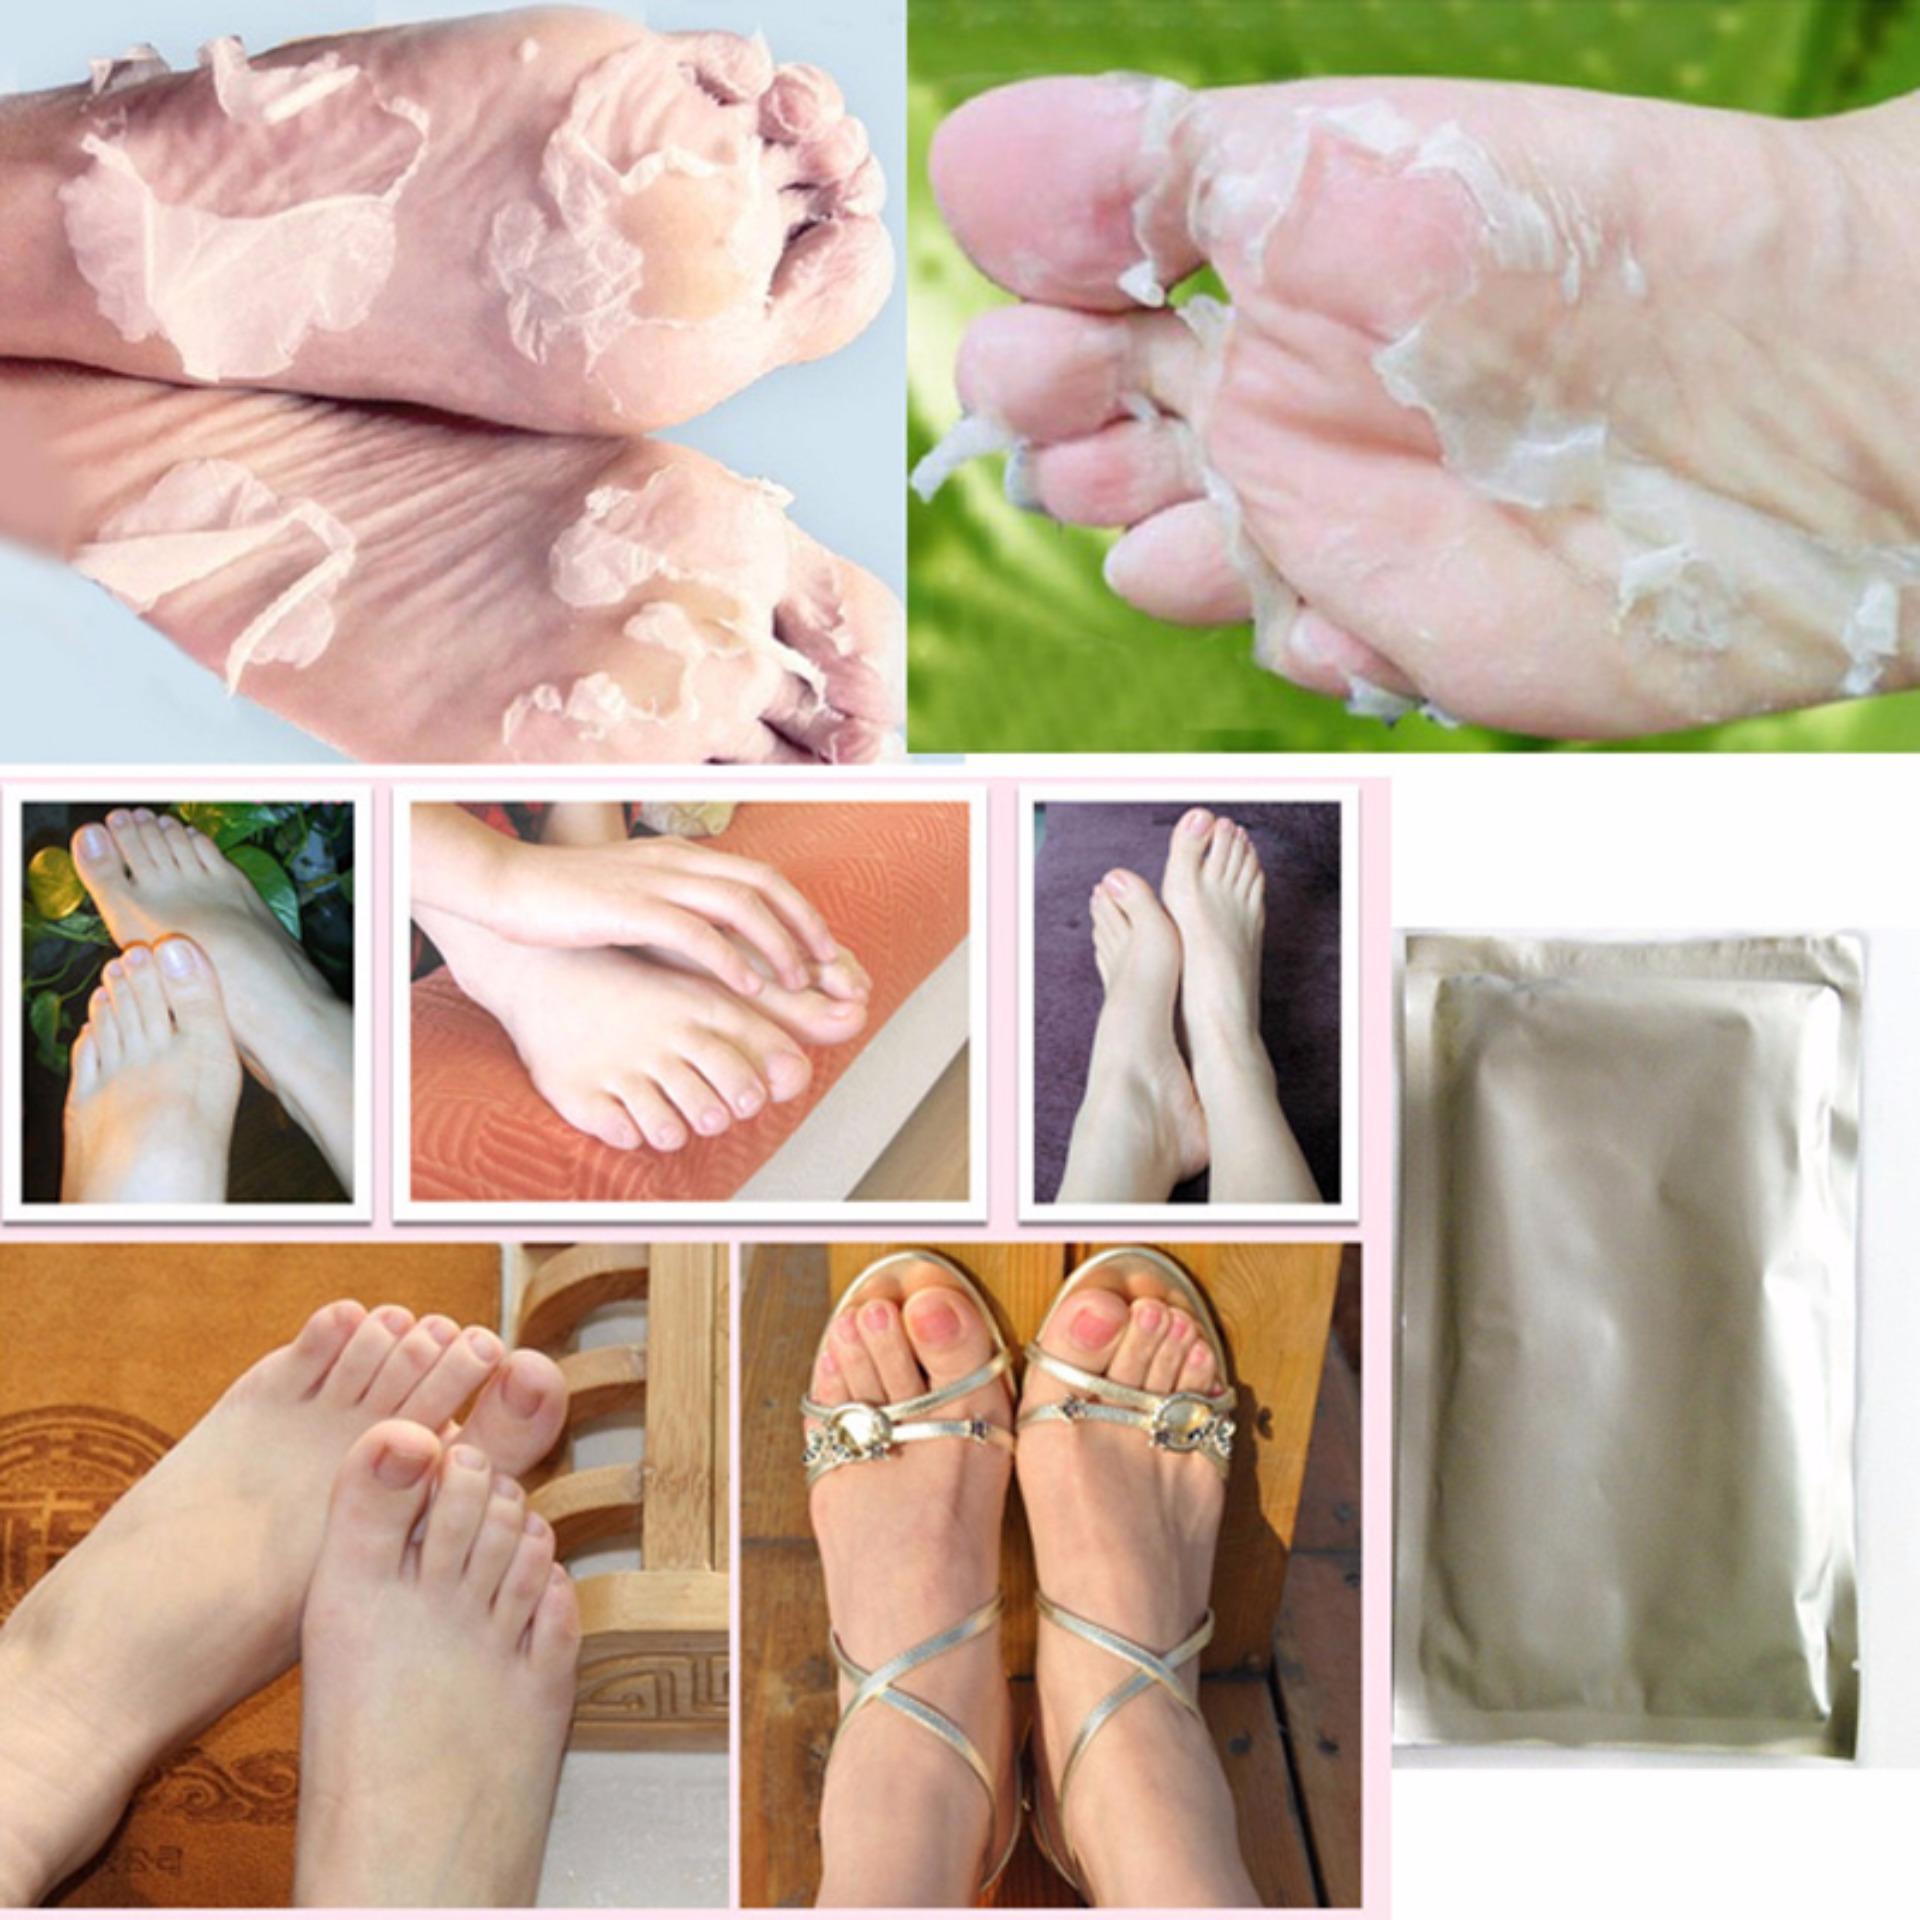 Baby Foot Peeling Mask Masker Kaki Daftar Harga Terbaik Terkini Muby Original Jamin Ngelupas Ngelopek 1 Pabrik Sama Hanaka Korea Kaos Gelpenghalus